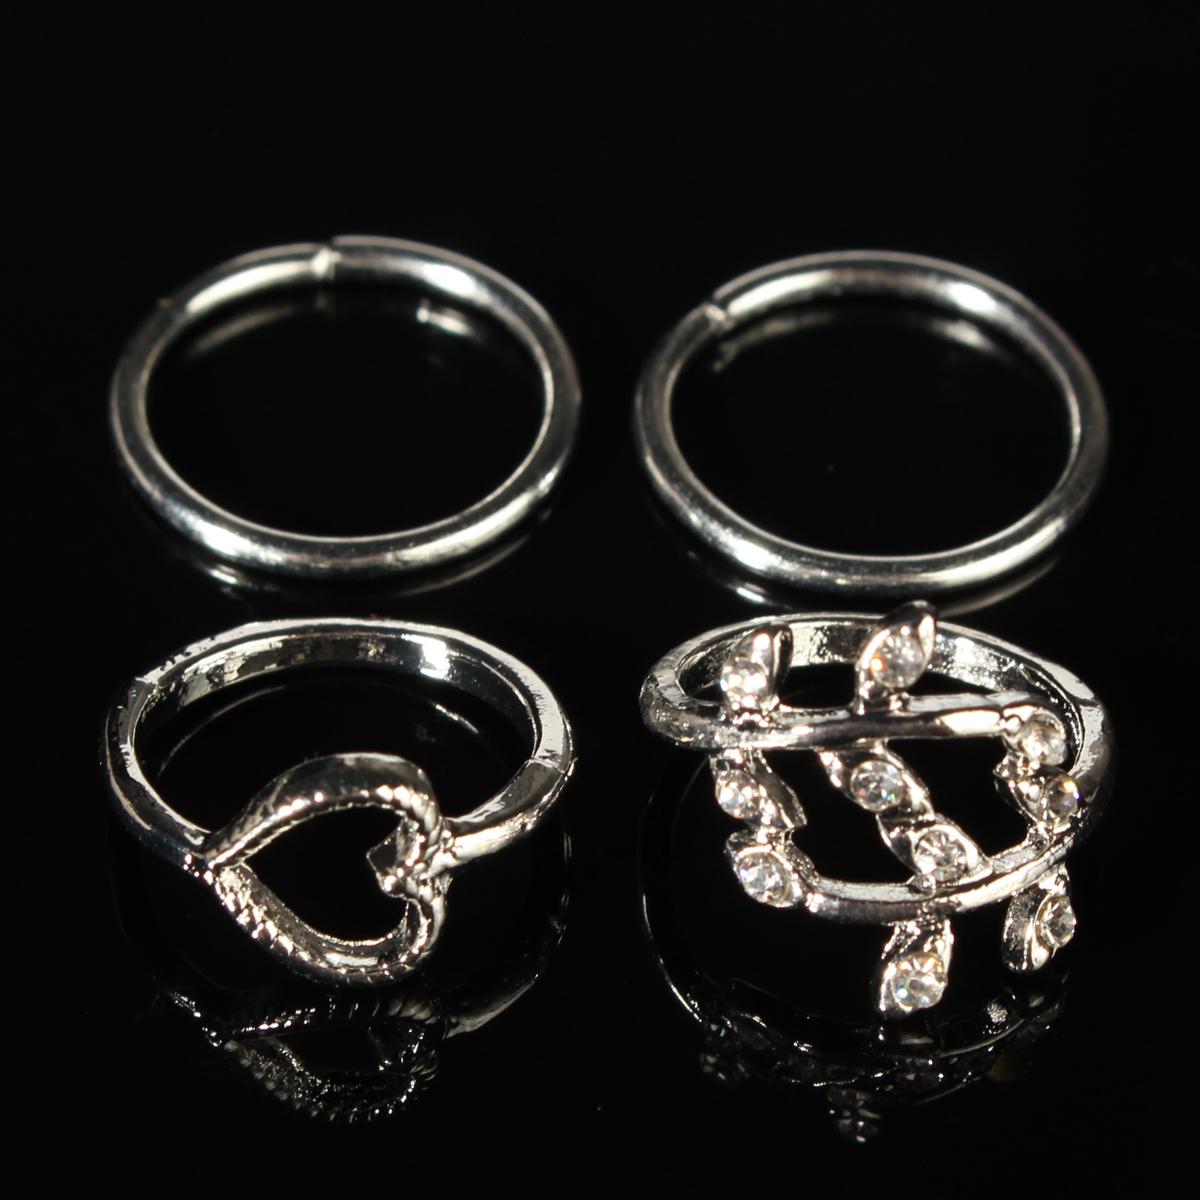 bague rose chat anneau cristal bijoux strass fantaisie. Black Bedroom Furniture Sets. Home Design Ideas